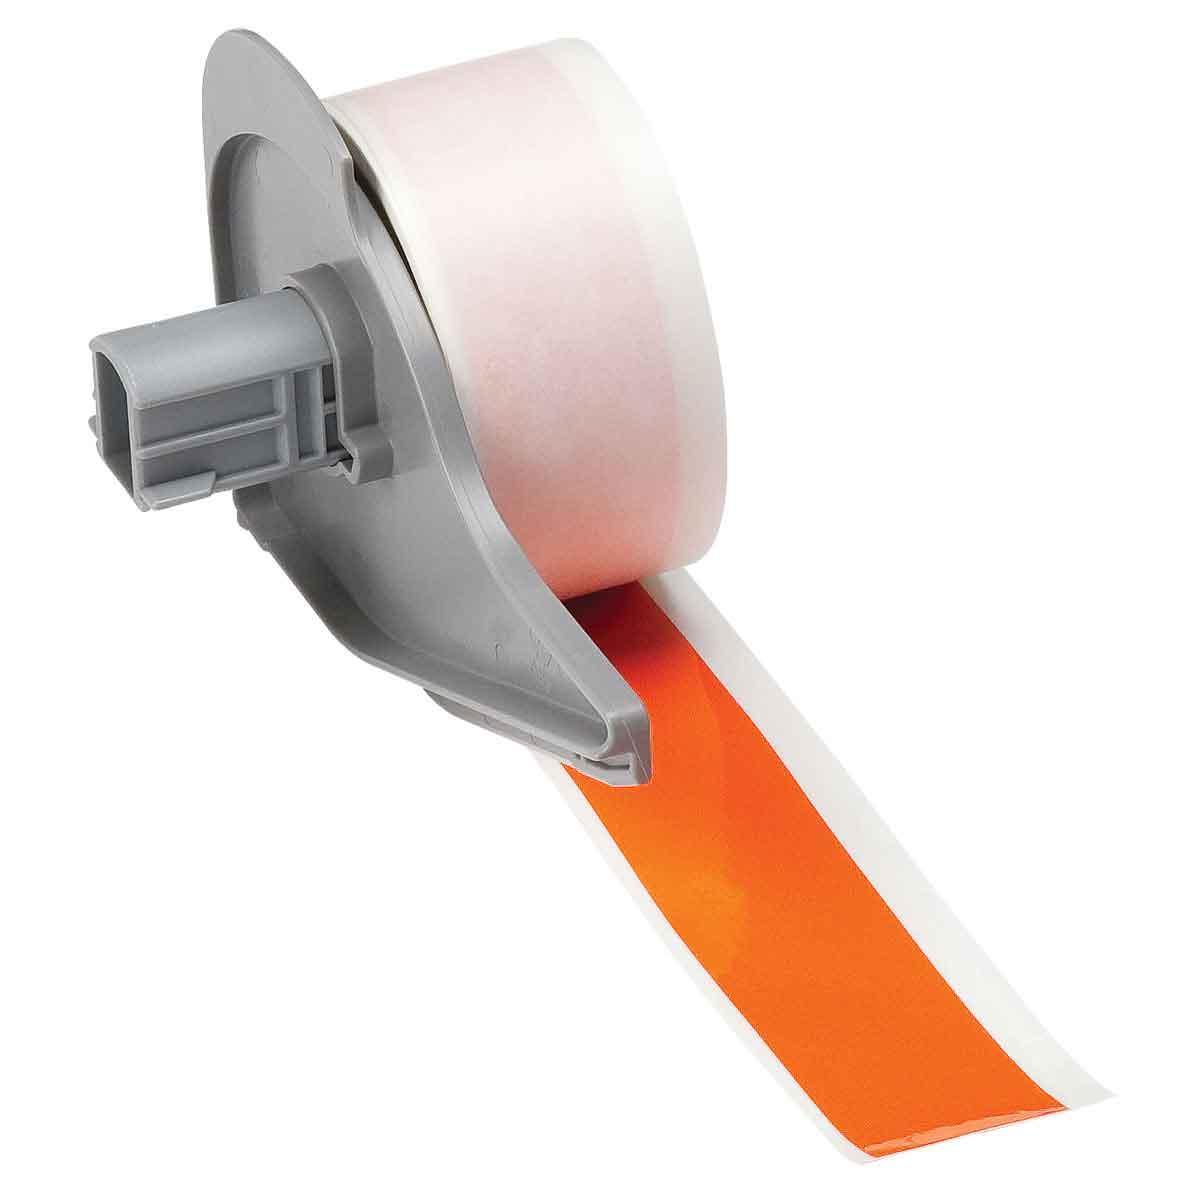 Brady® M71C-1000-595-OR Blank Thermal Transfer Tape, 50 ft L x 1 in W, Orange, B-595 Vinyl, Permanent Acrylic Adhesive, -40 to 180 deg F